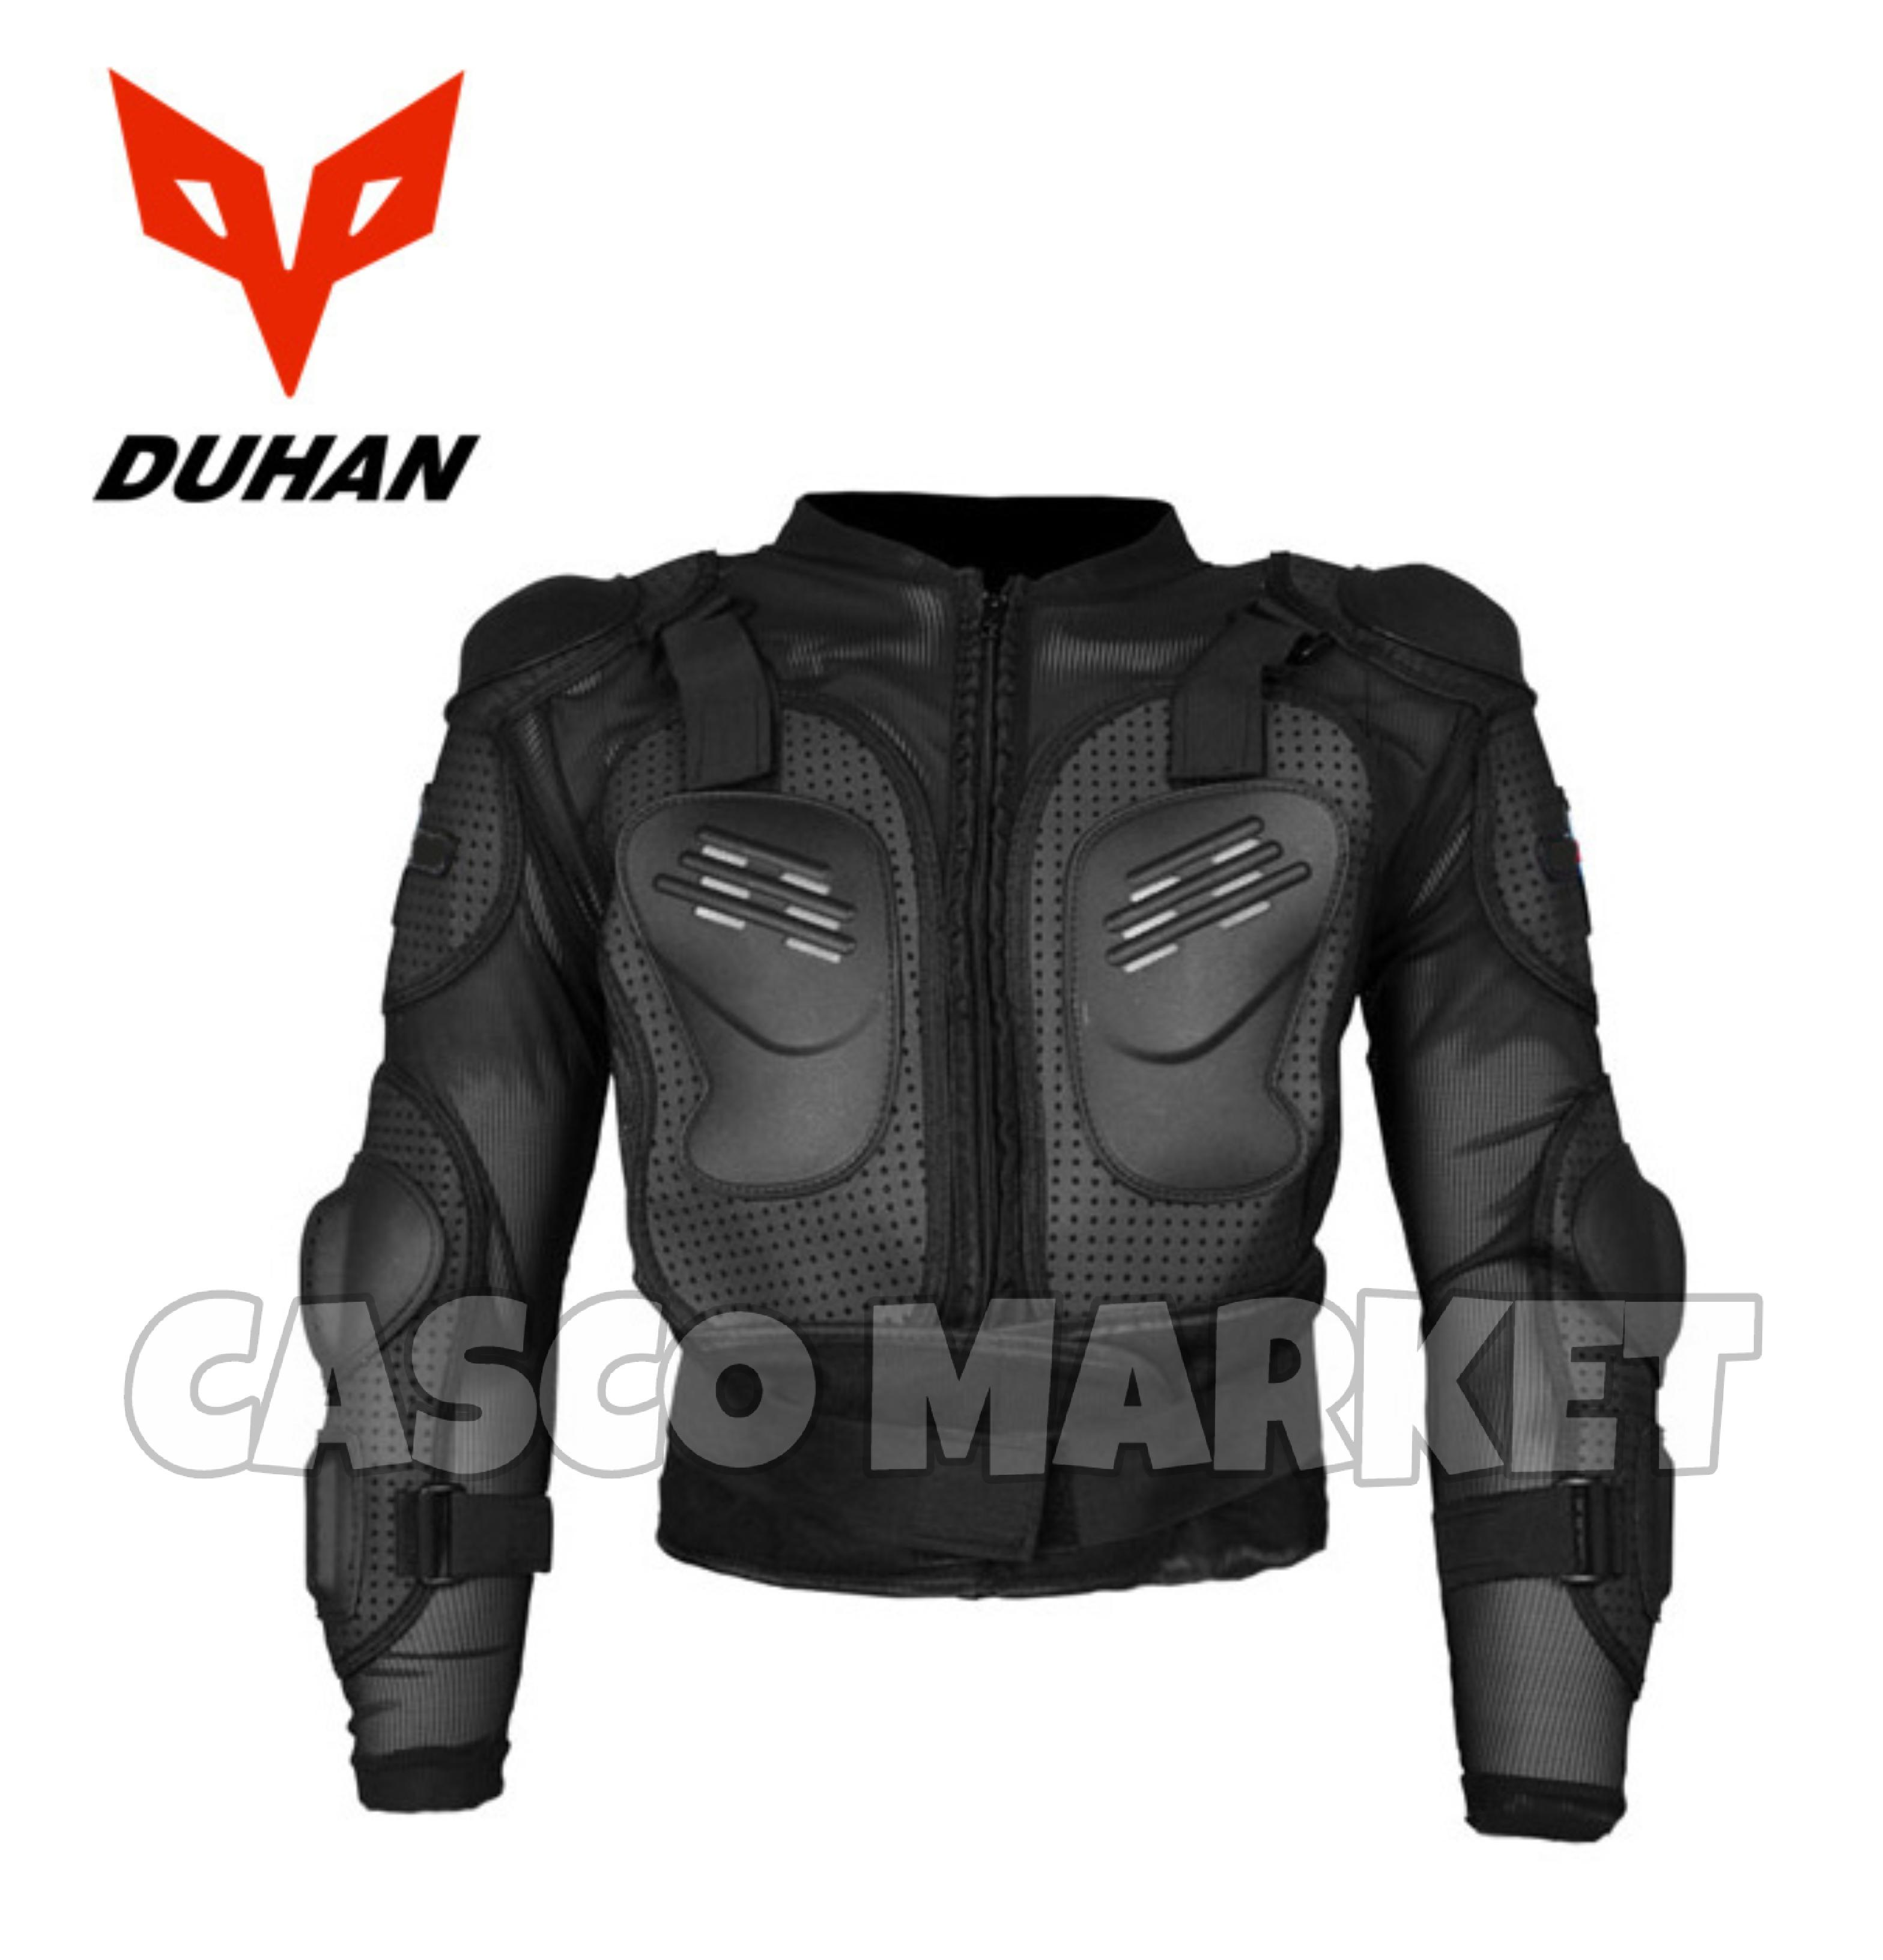 007b4f006630 DUHAN Moto Armor Motorcross Mx off road gear one size adjustable Full Body  Armor Jacket motocross